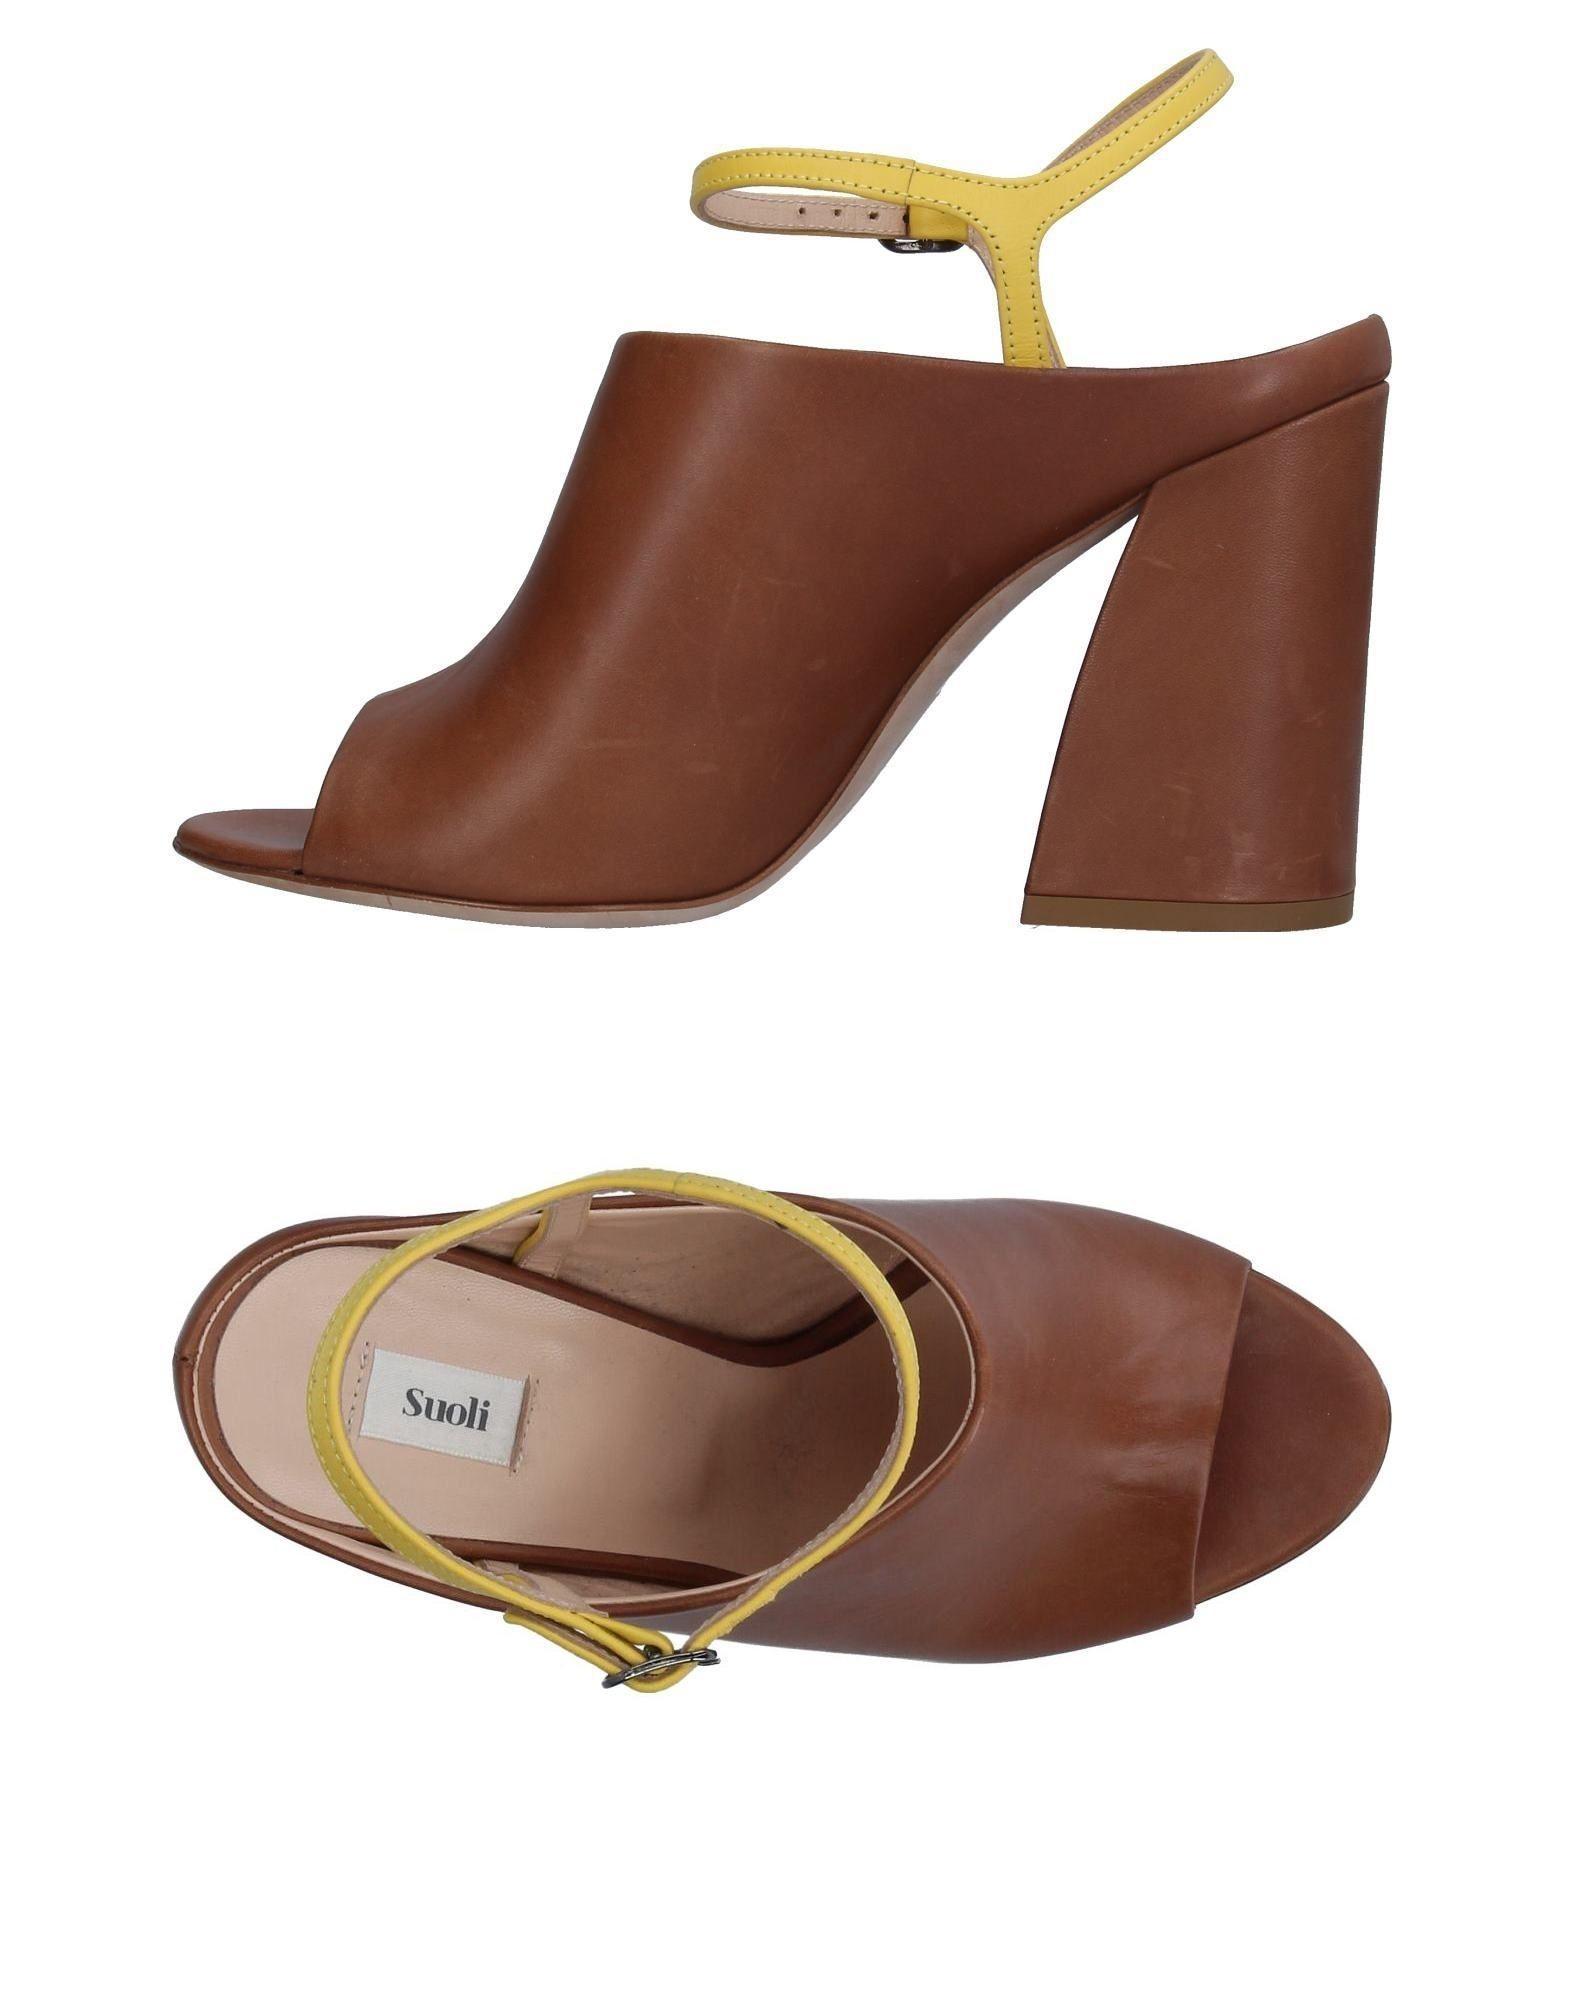 Sandales Suoli Femme - Sandales Suoli sur